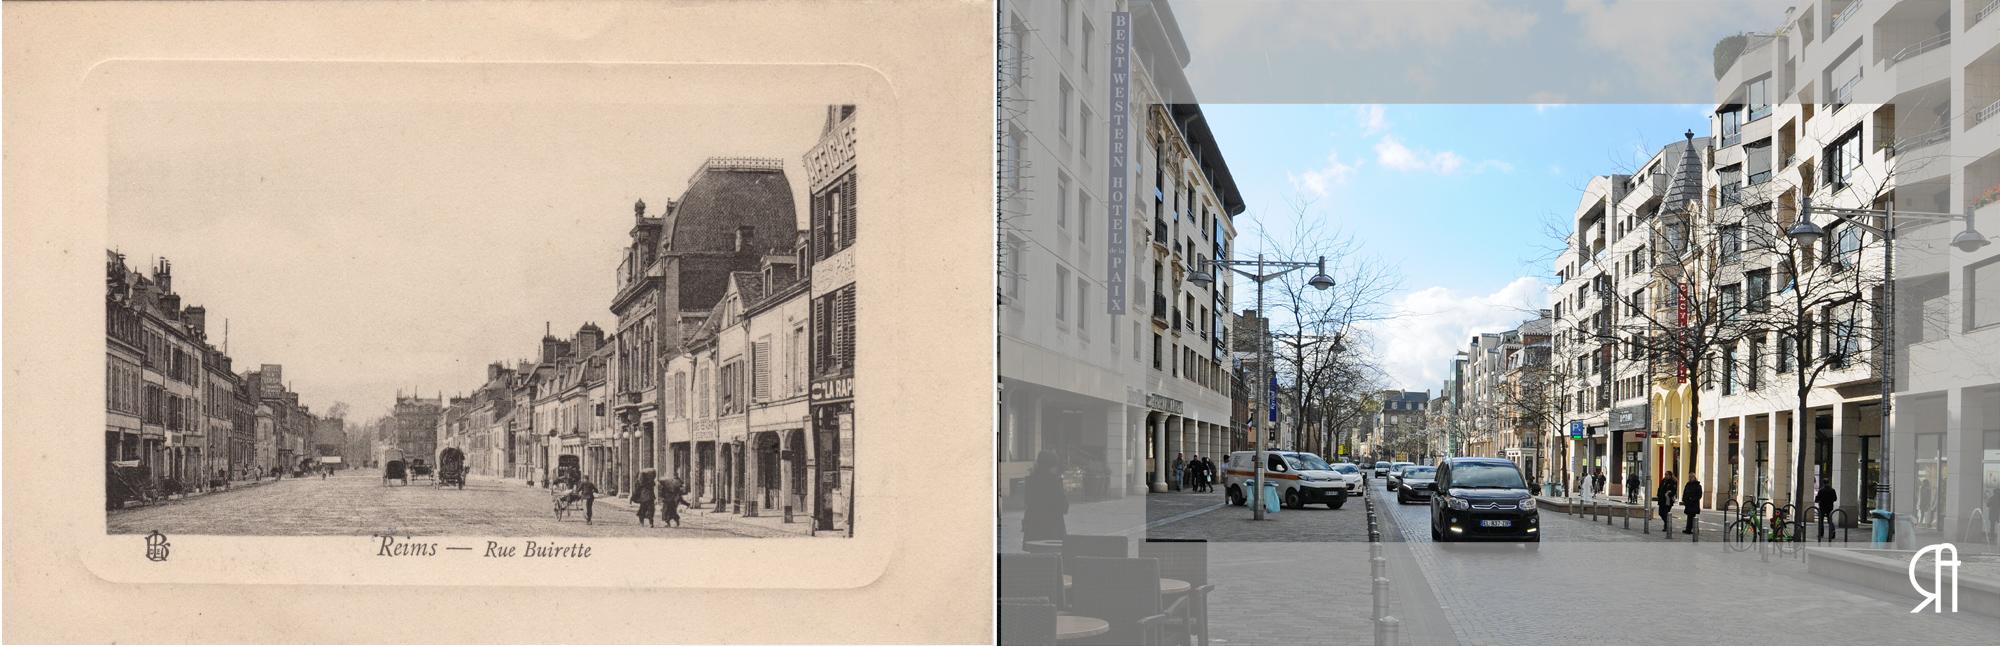 Rue Buirette avant la Grande Guerre.